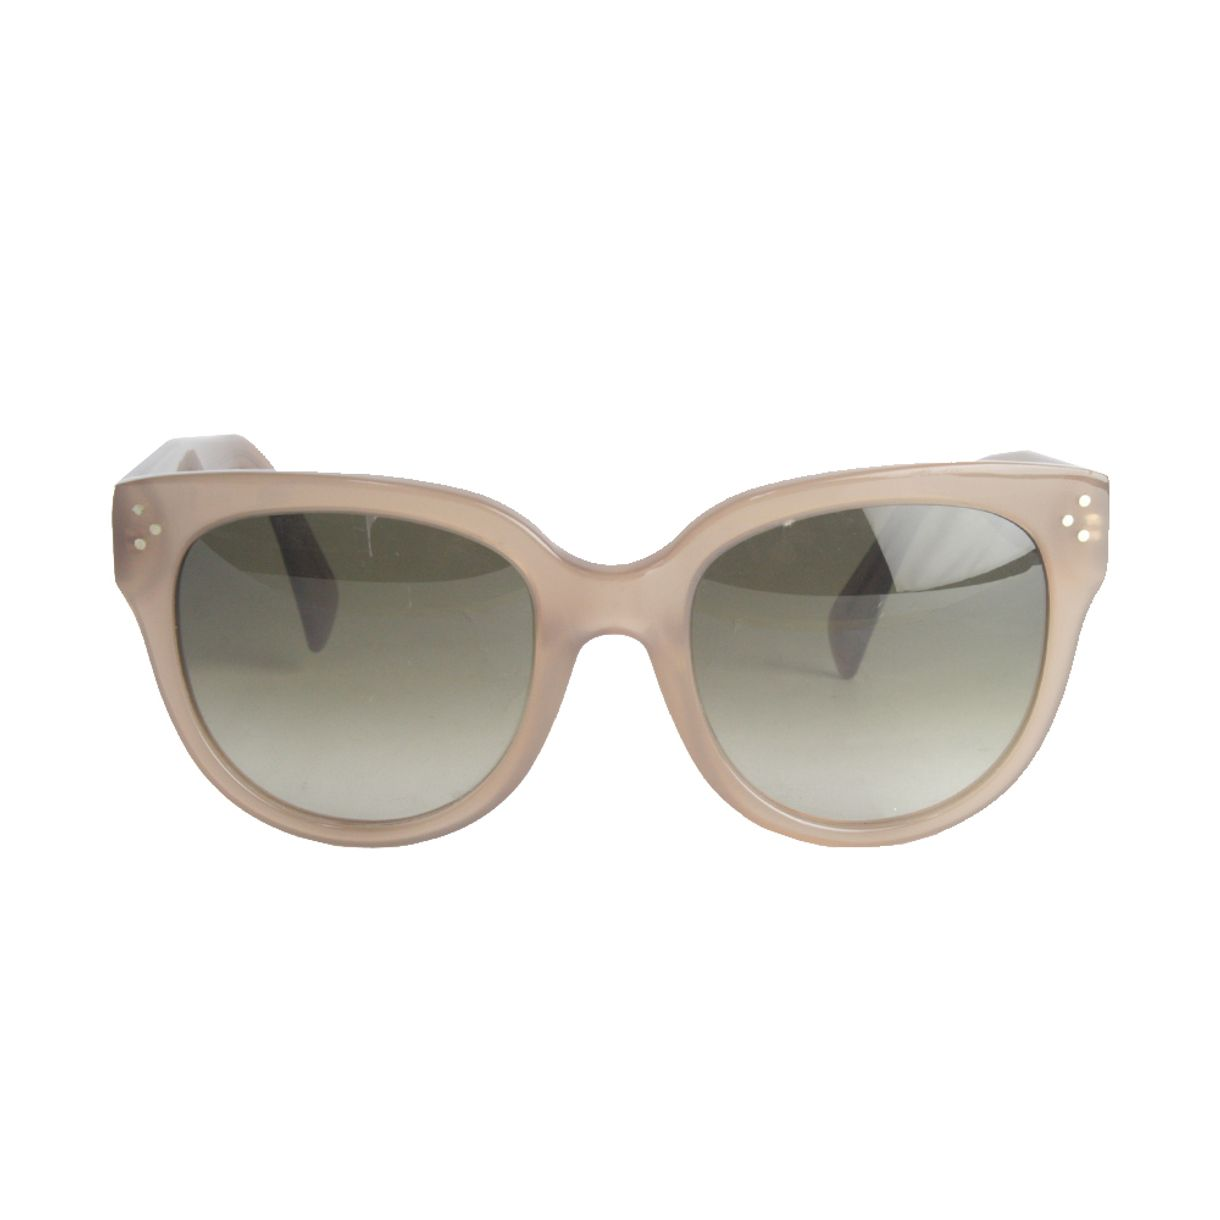 Oculos-Celine-SC-1755-Acetato-Fendi